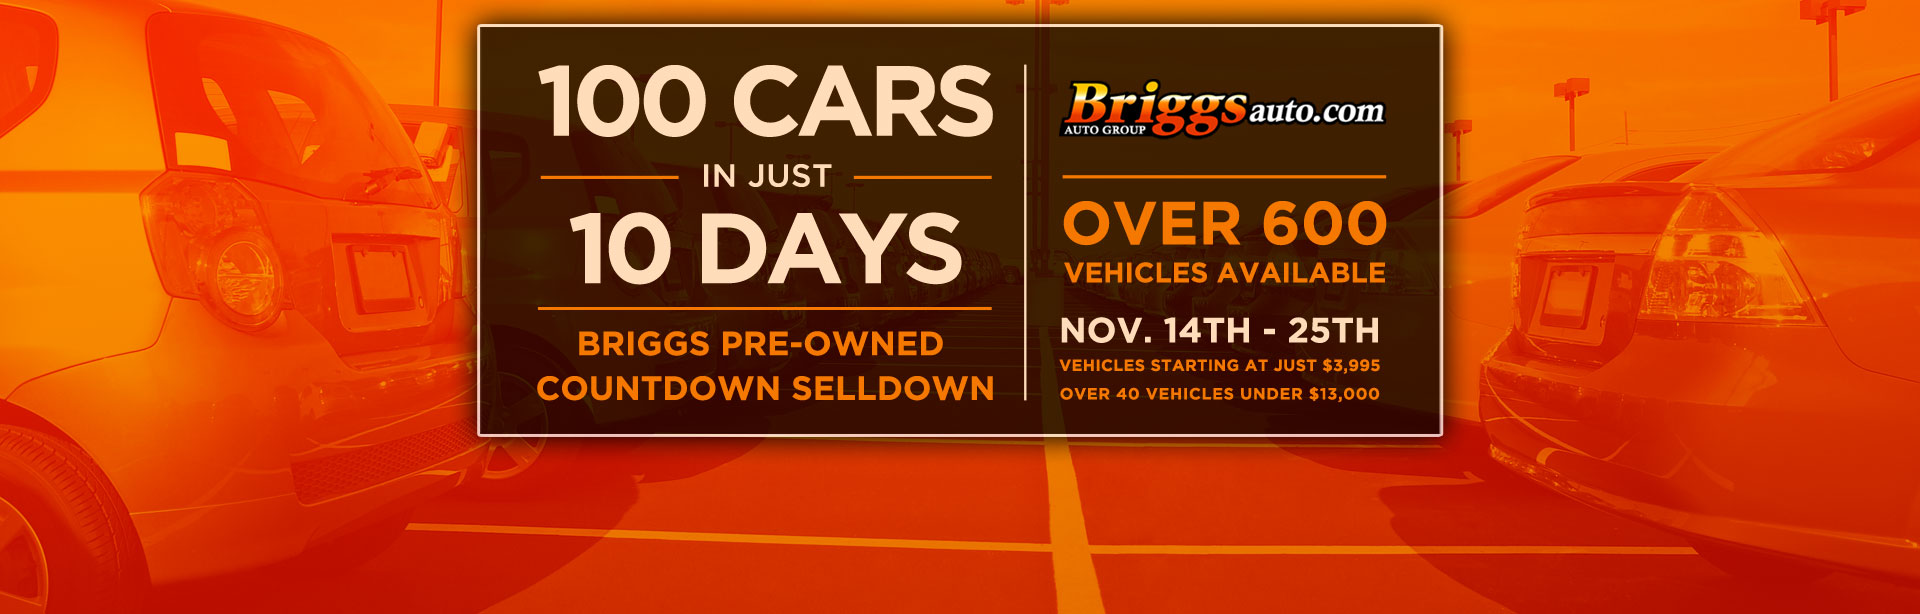 100 Cars 100 Days